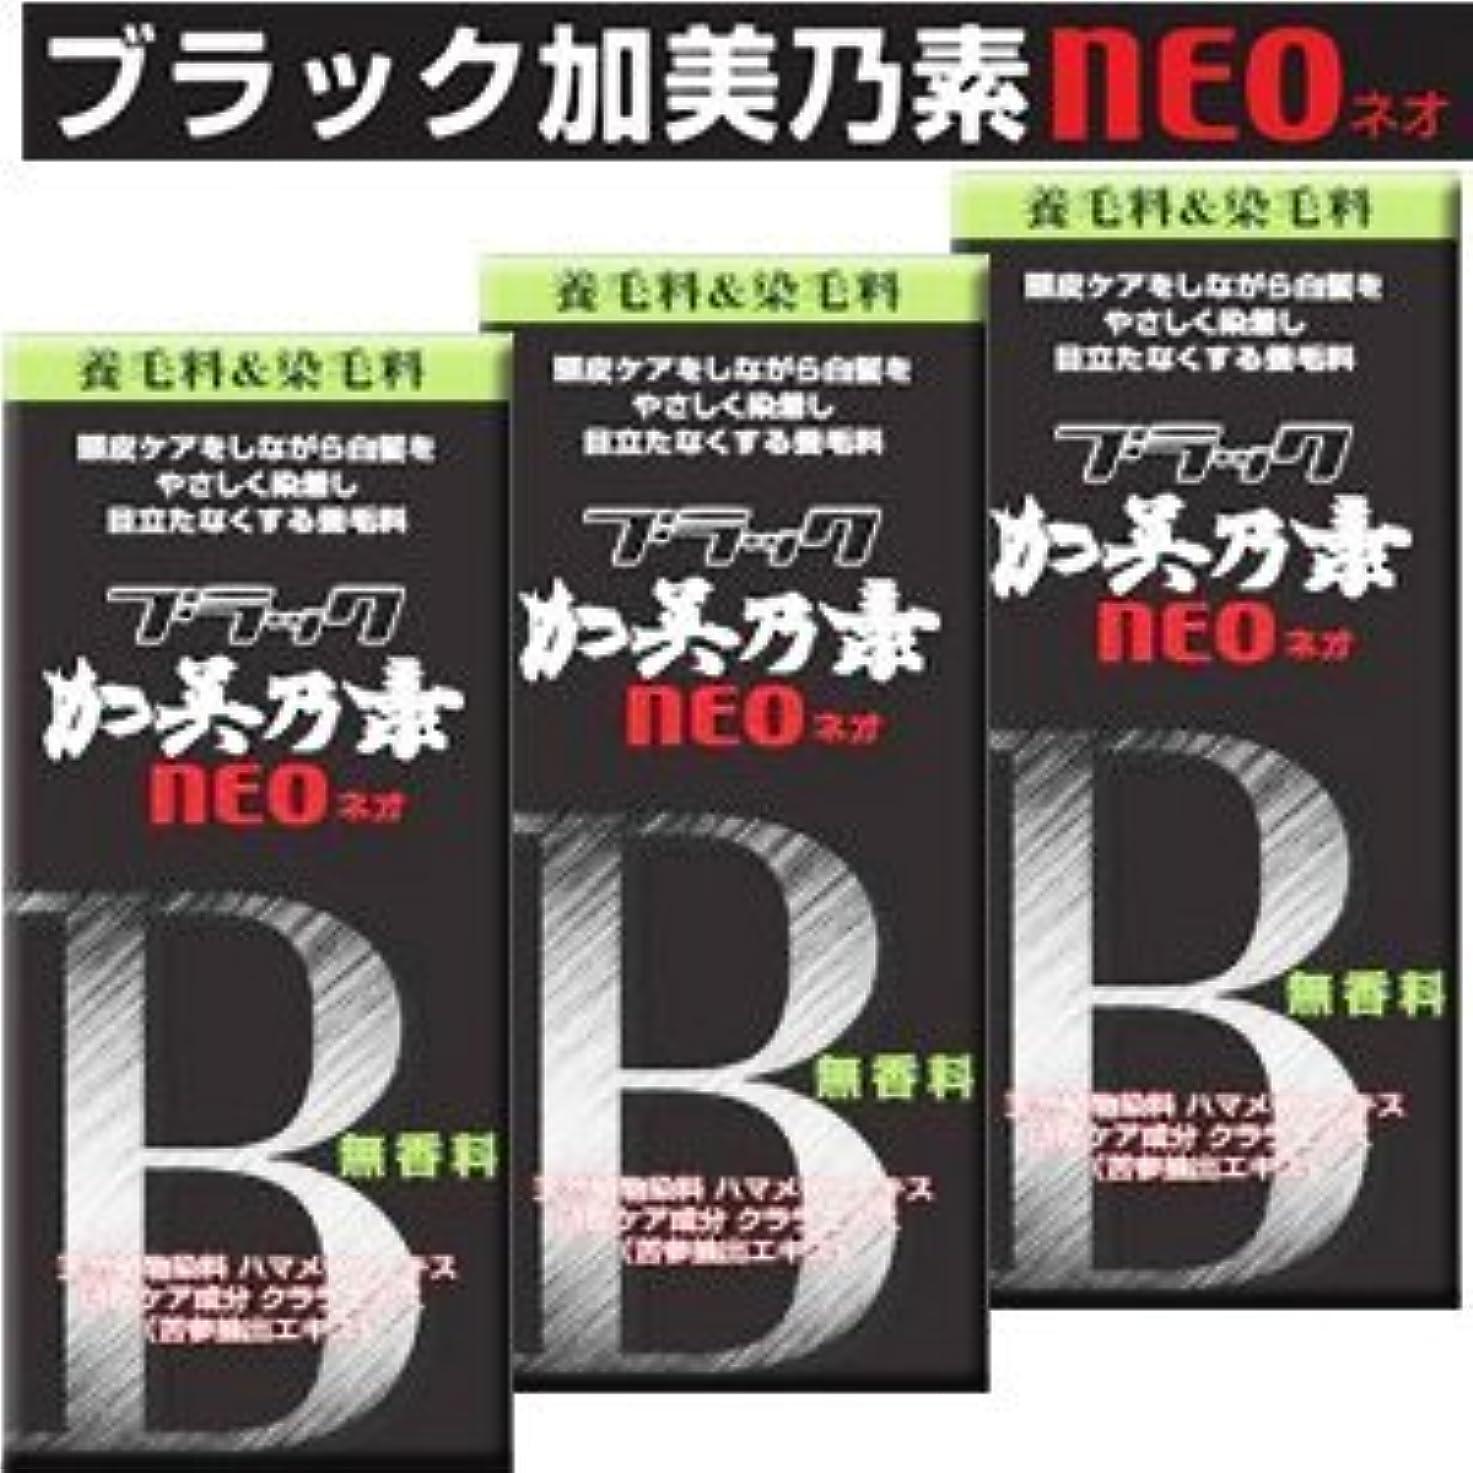 姿勢荷物空白【3個】 ブラック加美乃素NEO 無香料 150mlx3個 (4987046370105)